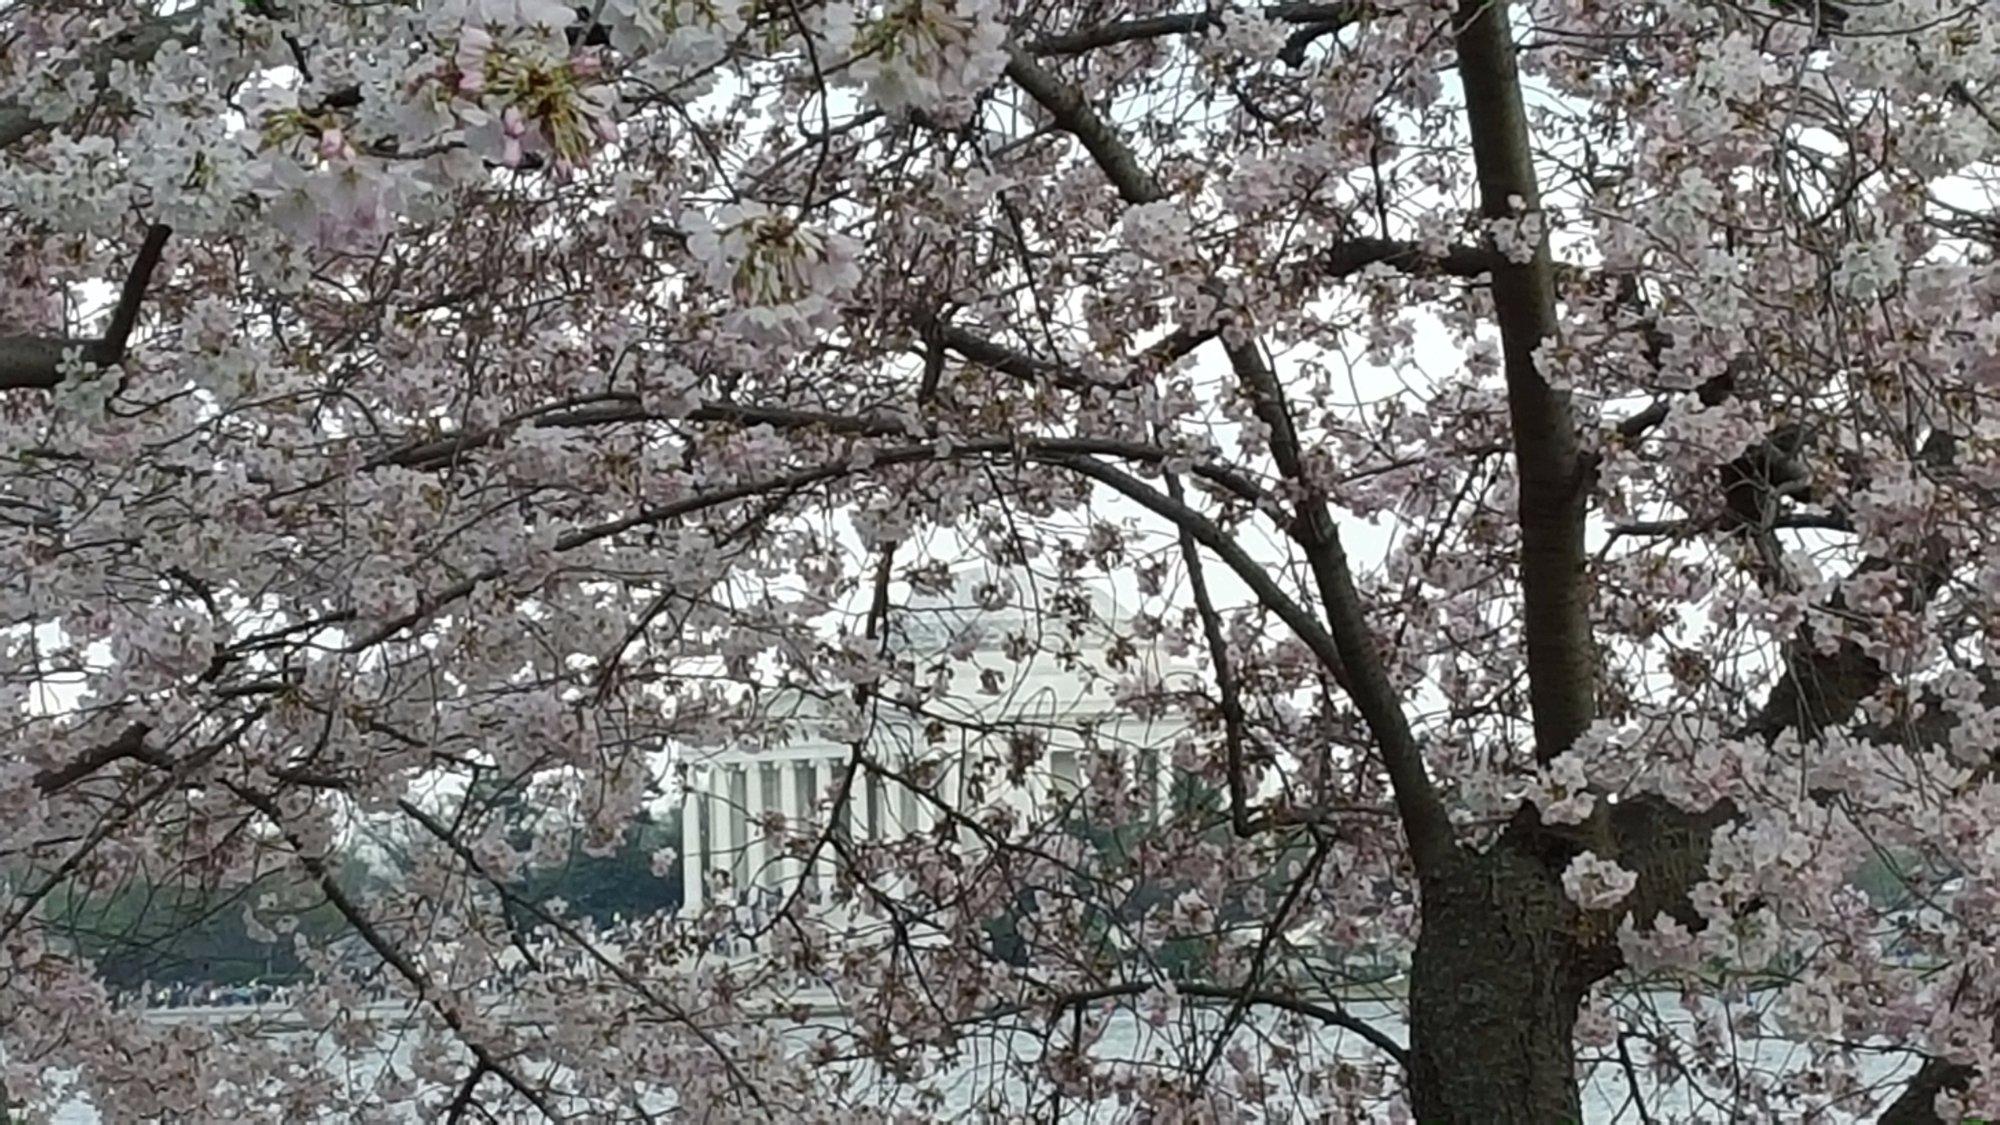 Tidal Basin, Washington, DC during Cherry Blossoms